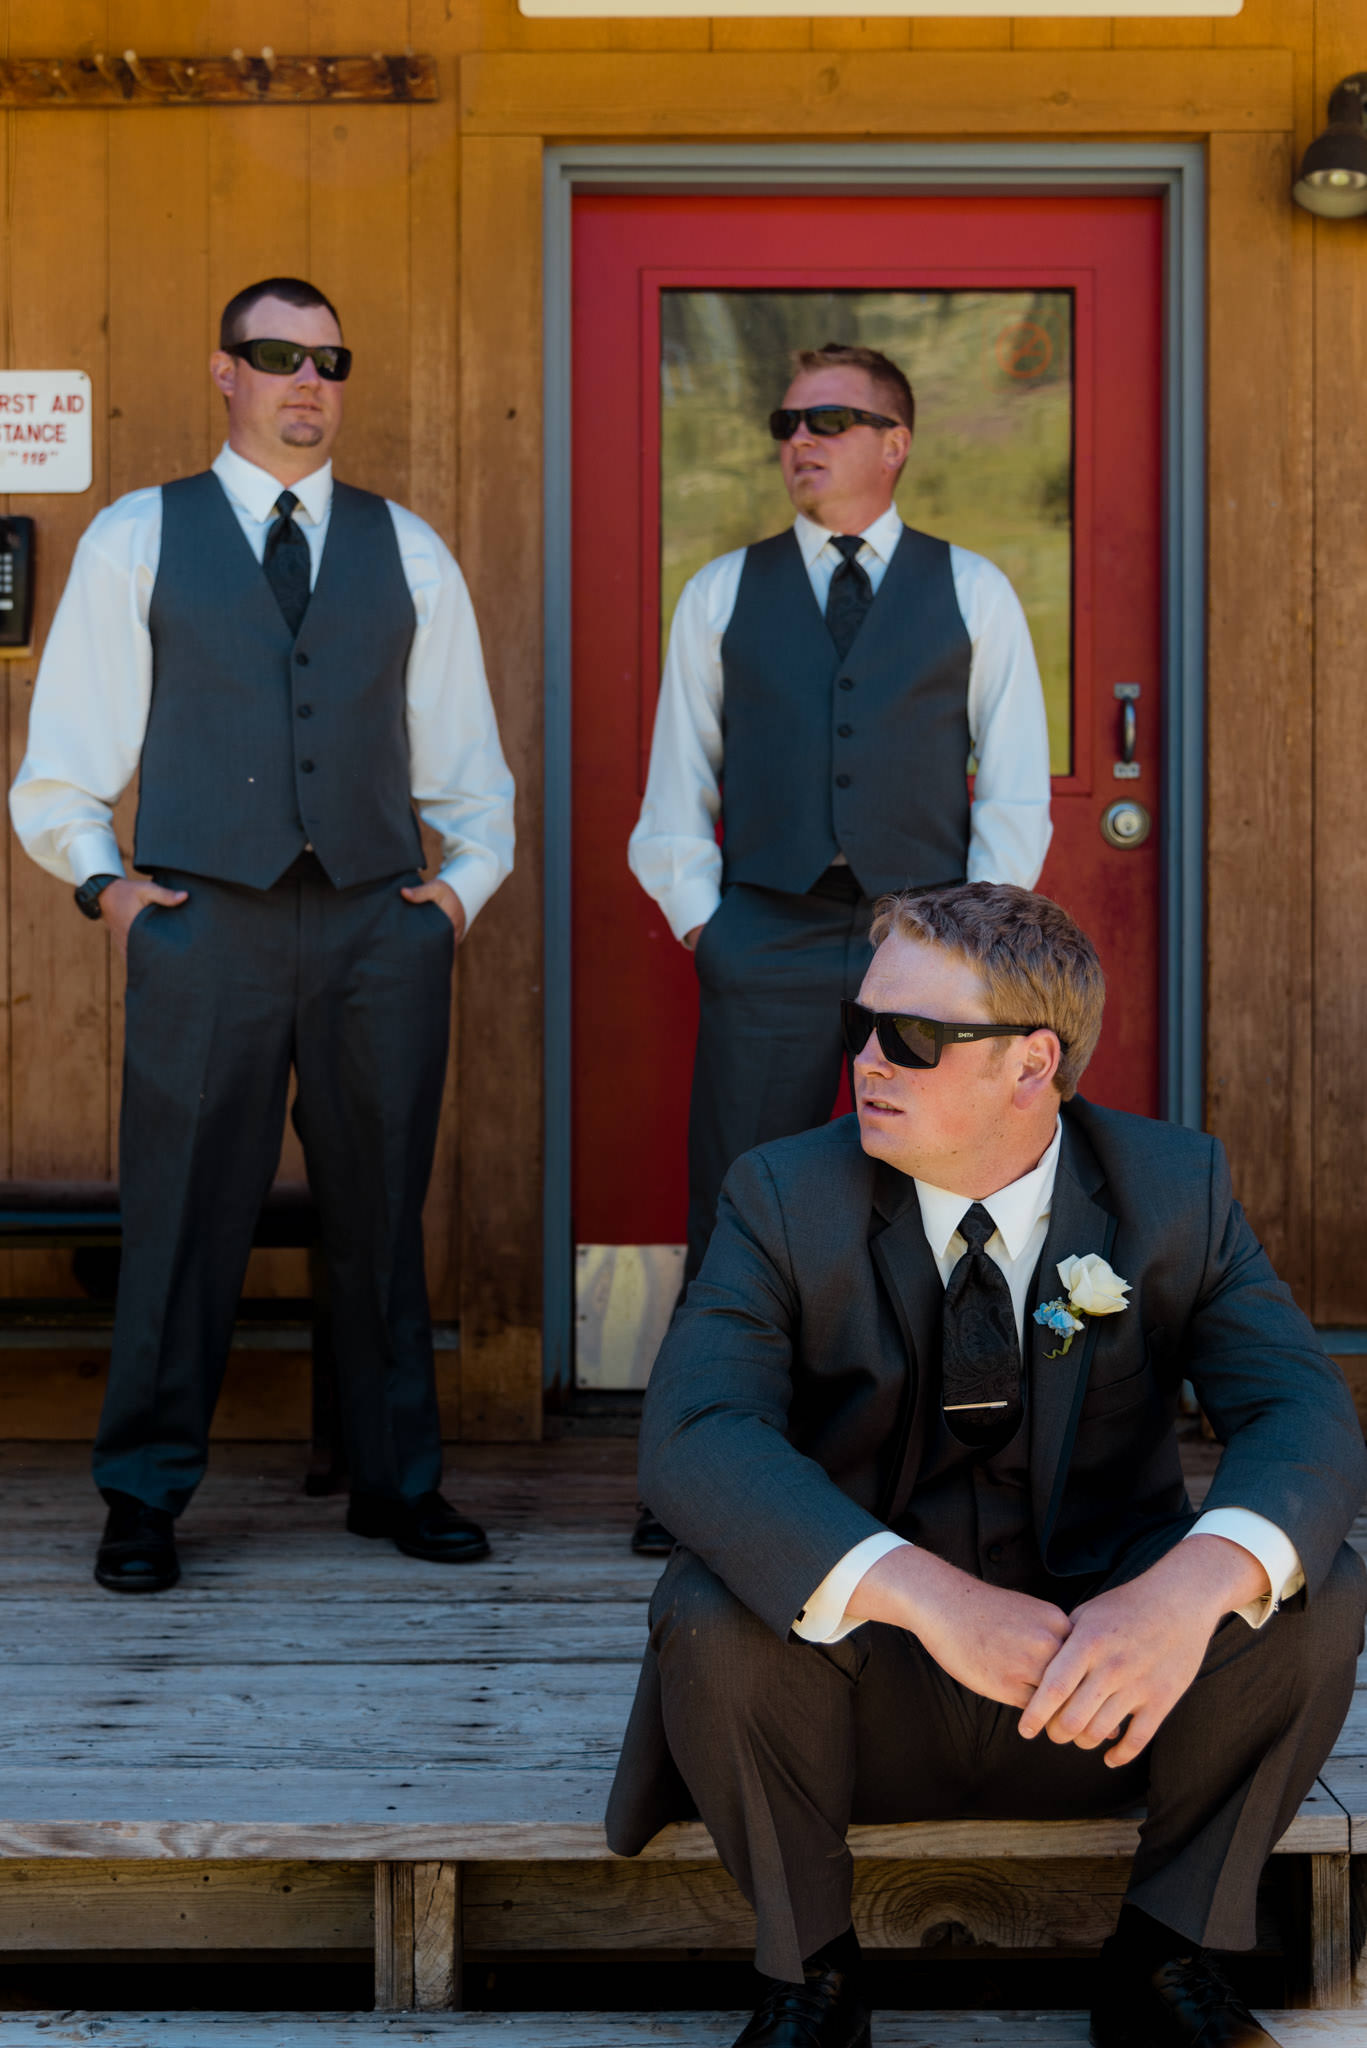 Zilla Photography Wild Adventure Mountain Wedding Groomsmen